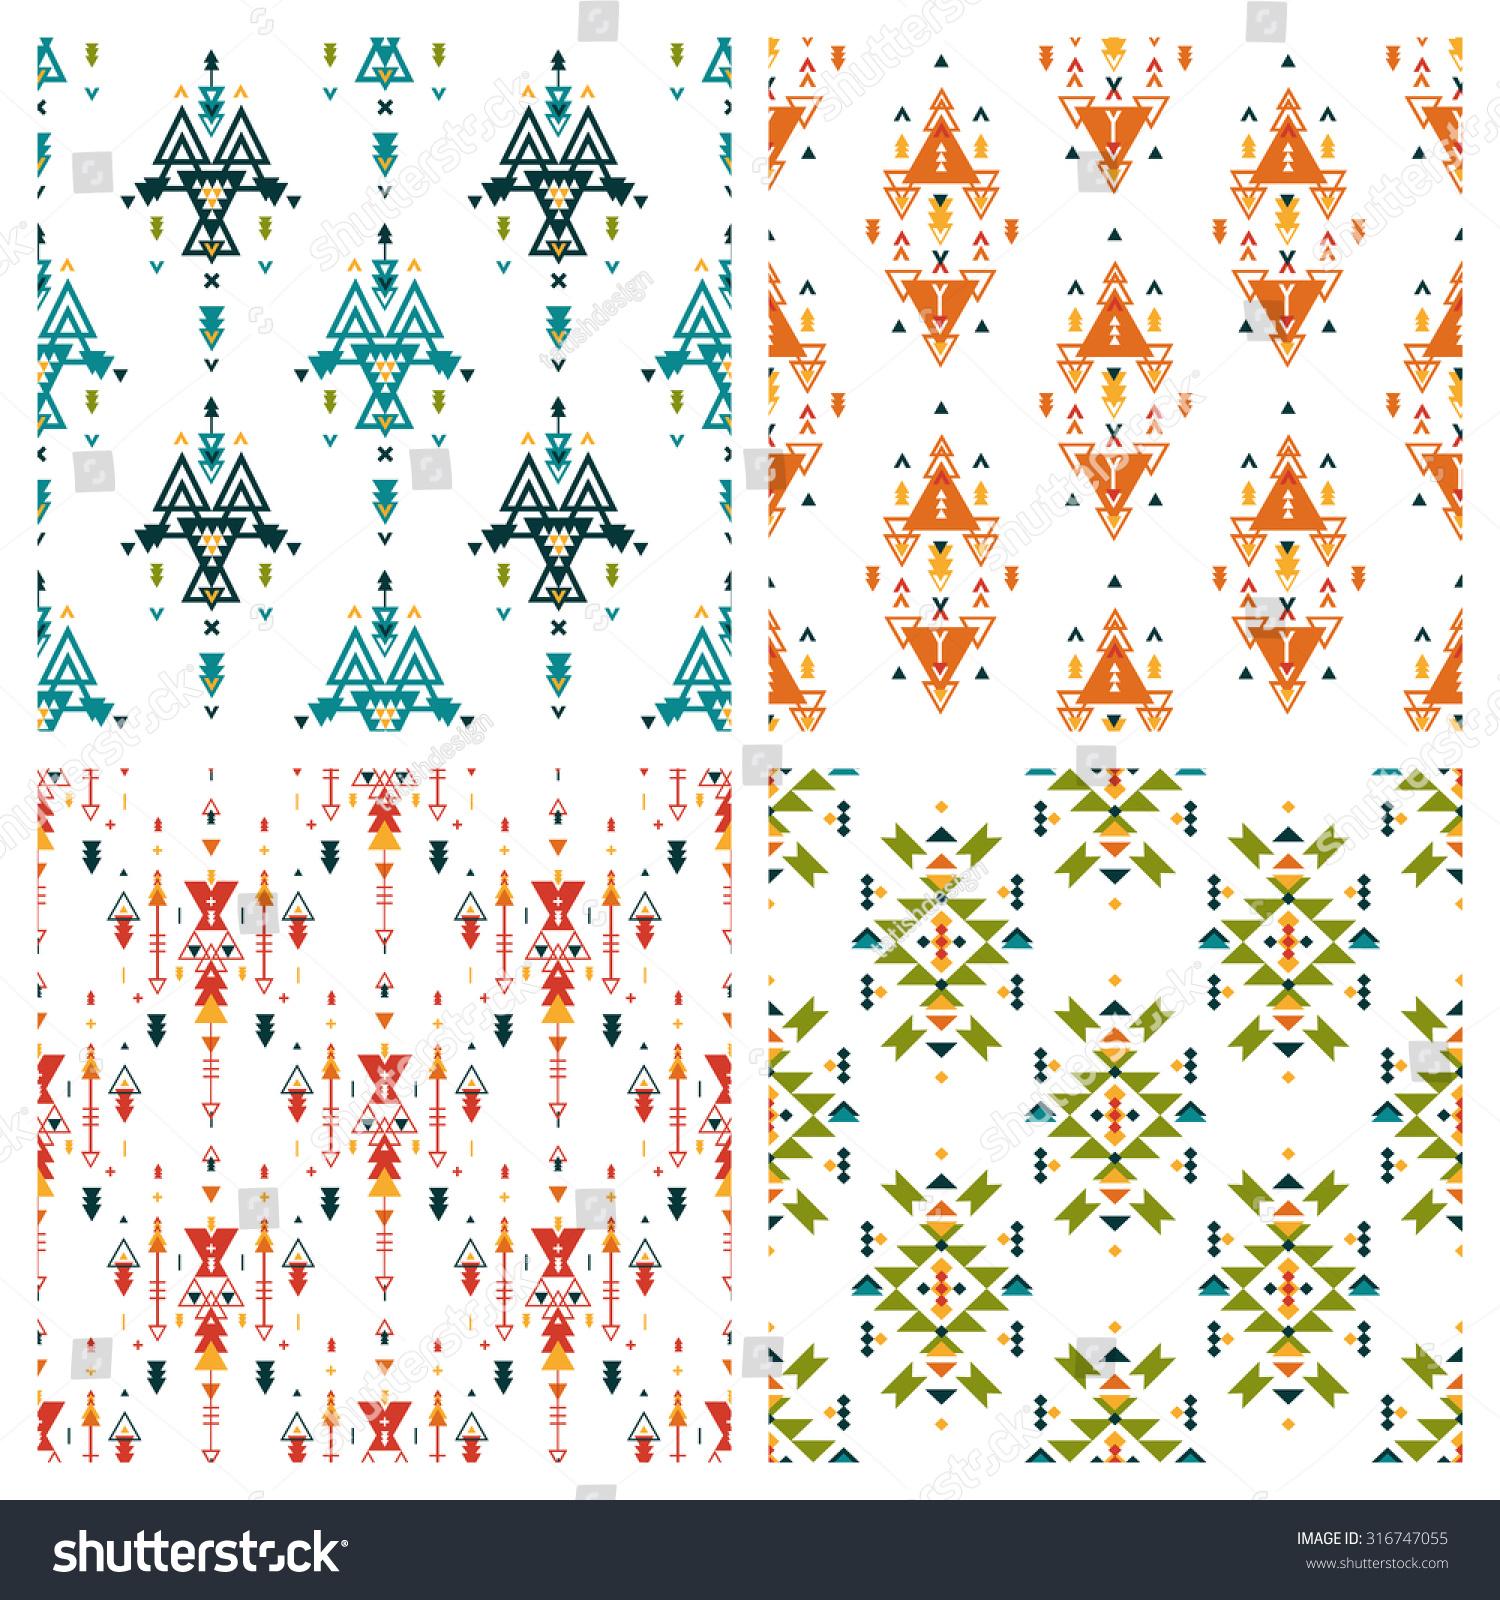 Kwc Ava Kitchen Faucet Set Of Ethnic Geometric Seamless Patterns Stock Vector